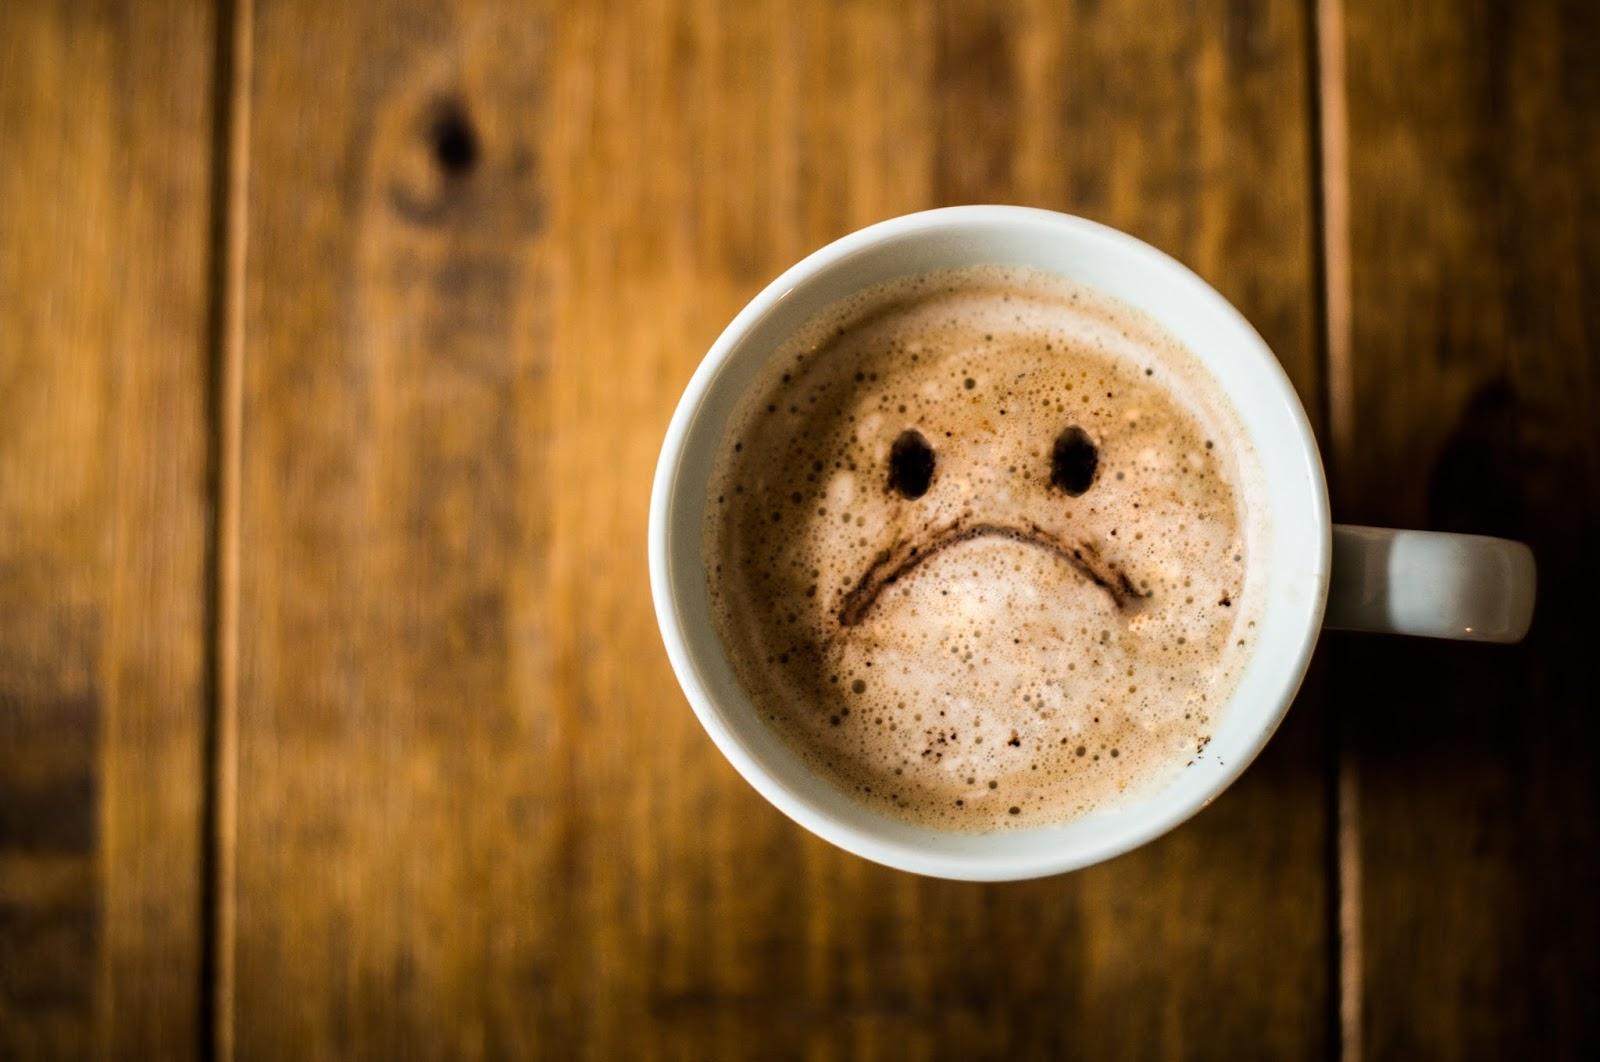 Monash University Low FODMAP Diet: Does caffeine affect IBS symptoms?